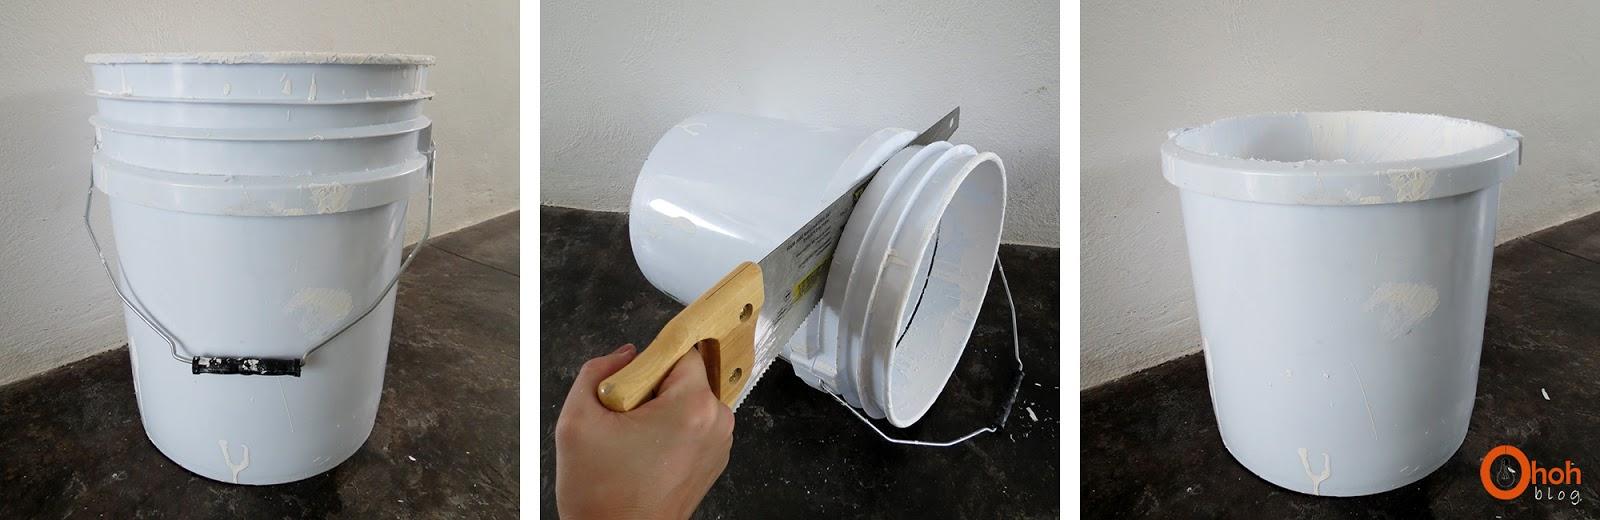 Diy Make A Stool With Bucket 1 Ohoh Blog